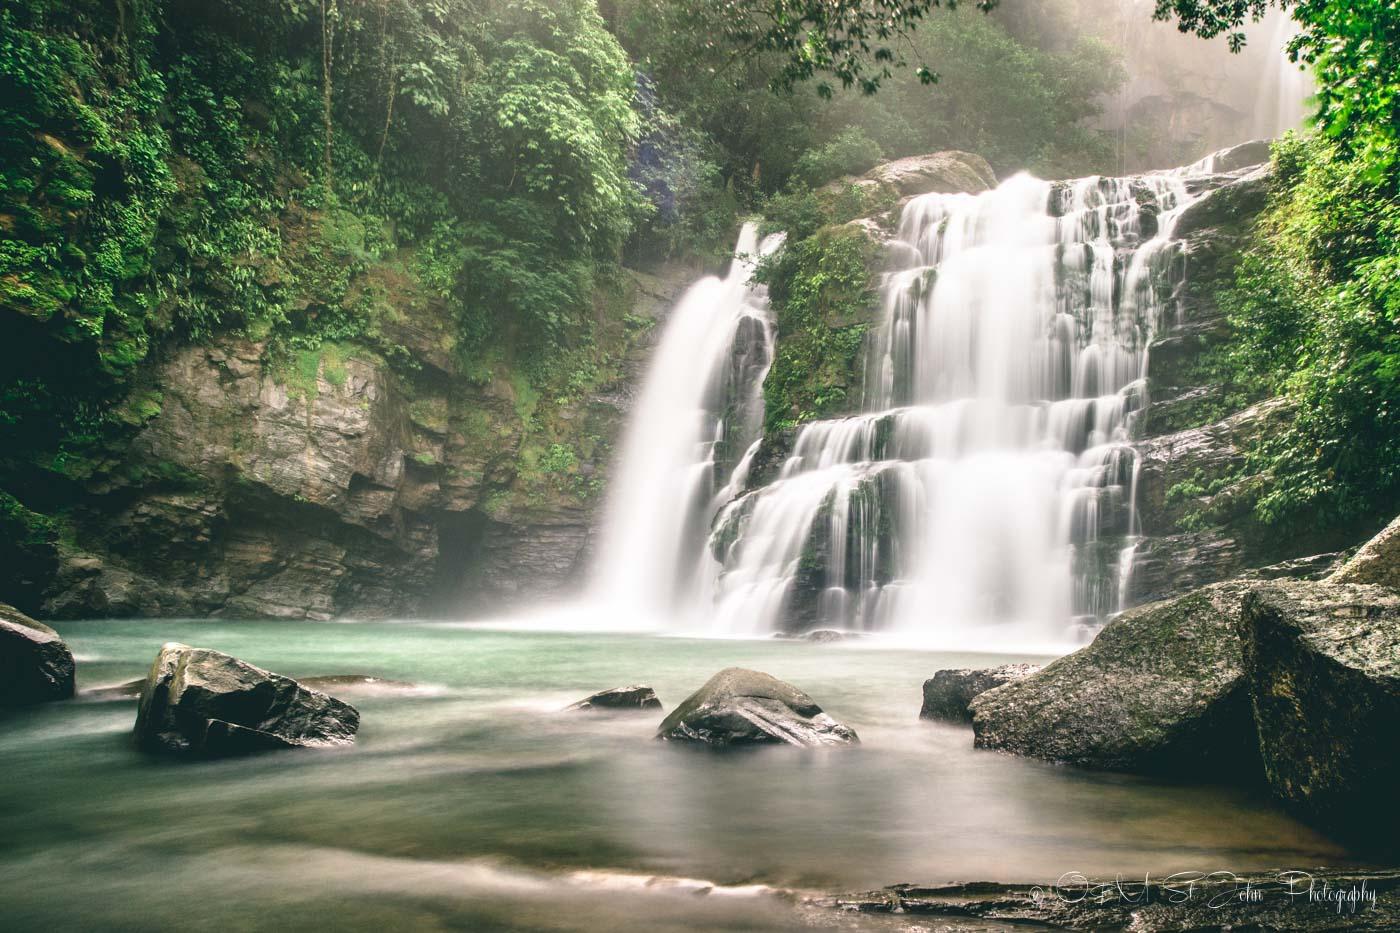 Nuayaca Waterfall, Dominical, Costa Rica